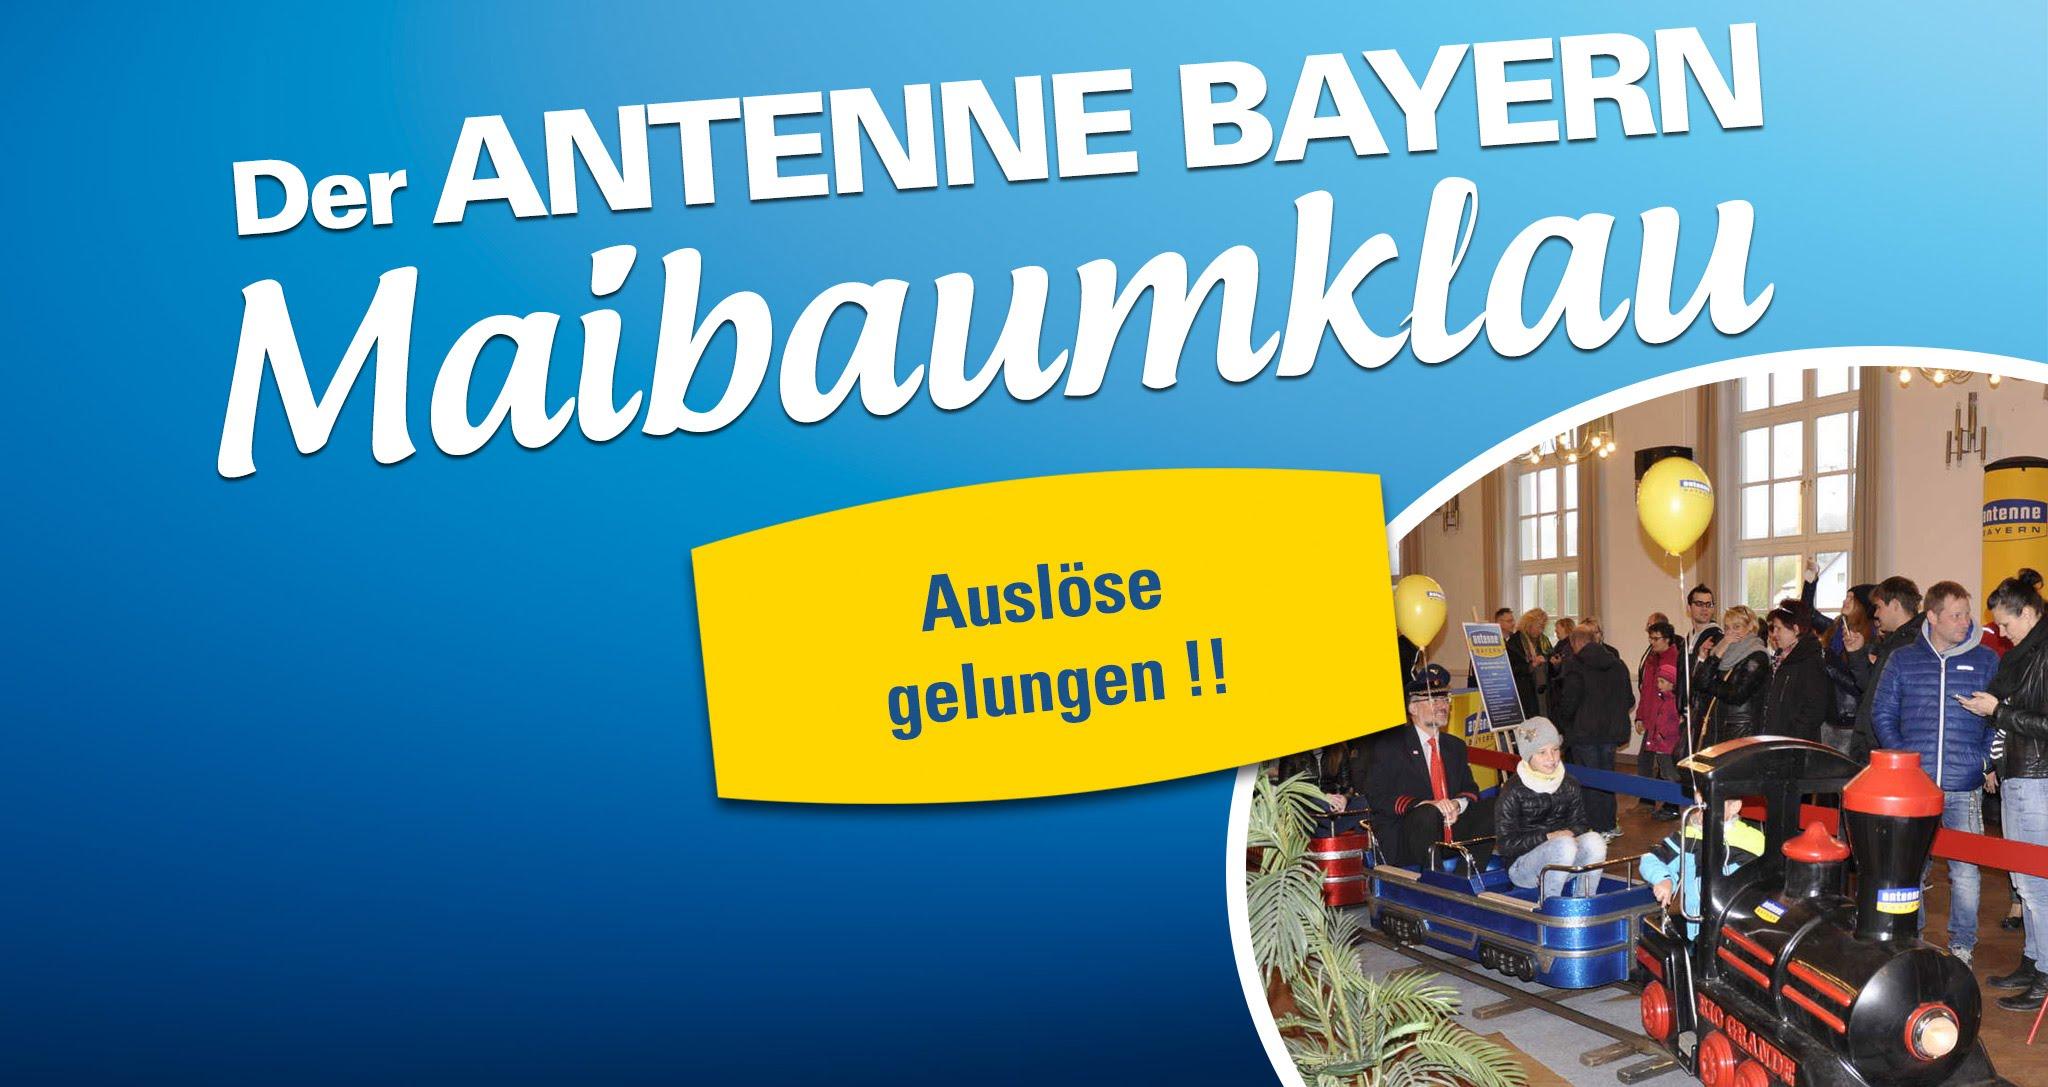 Antenne Bayern Maibaum